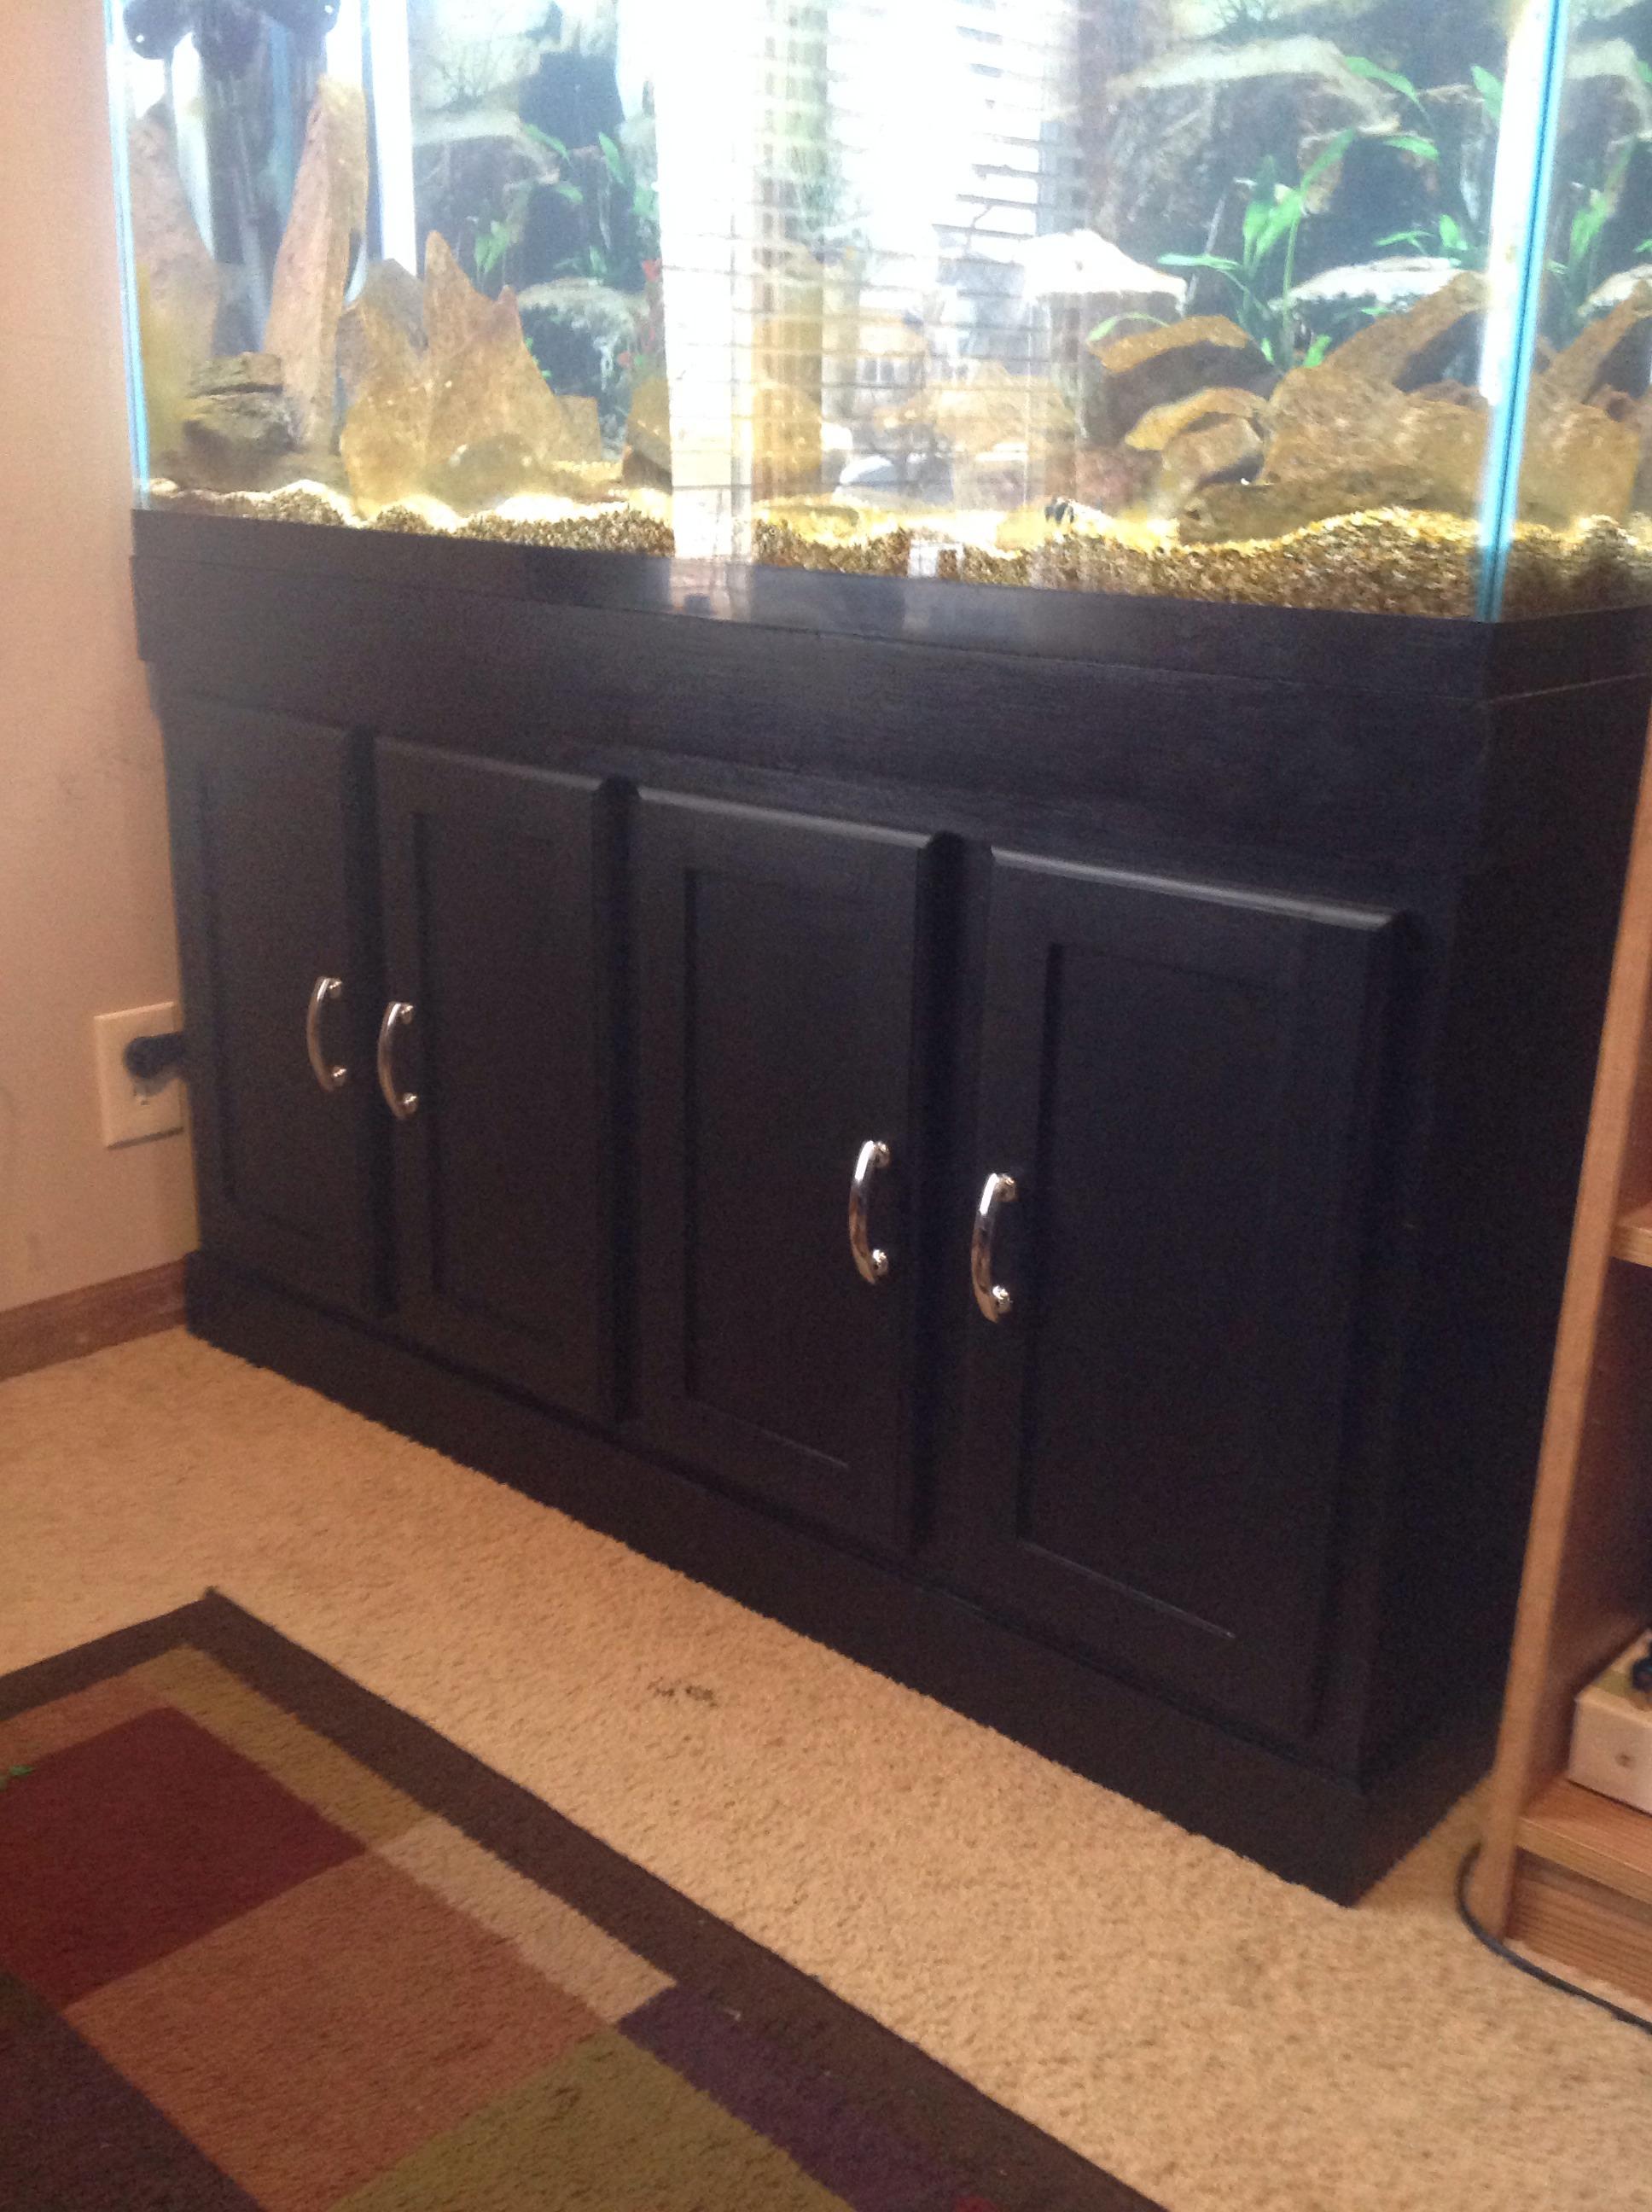 Fish tank tv stand - Aquarium Stand With Secret Door For Sump